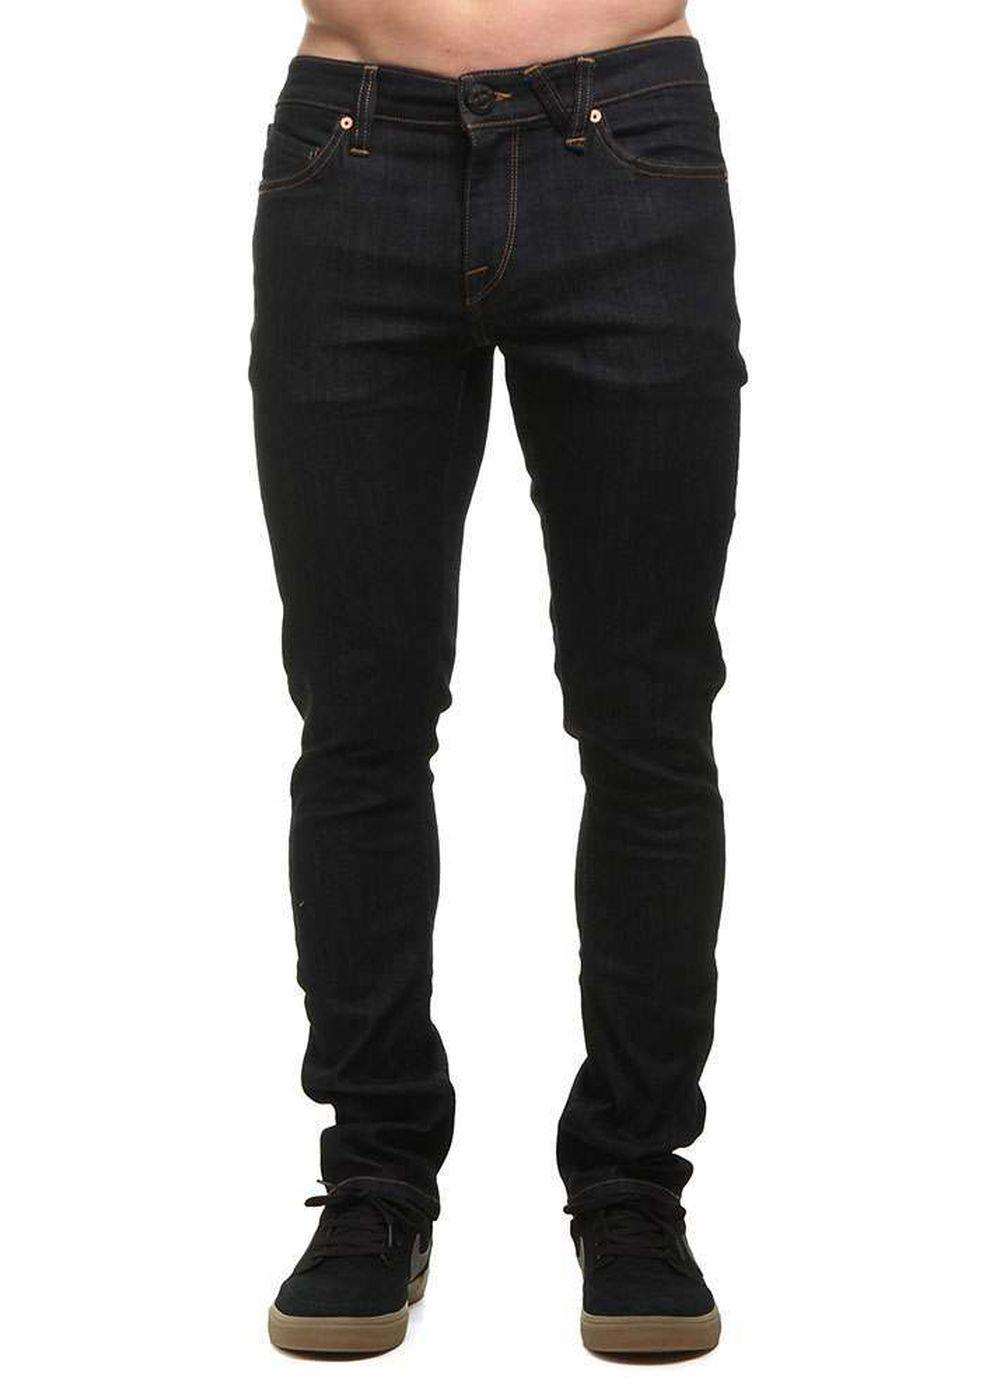 volcom-2x4-jeans-rinse